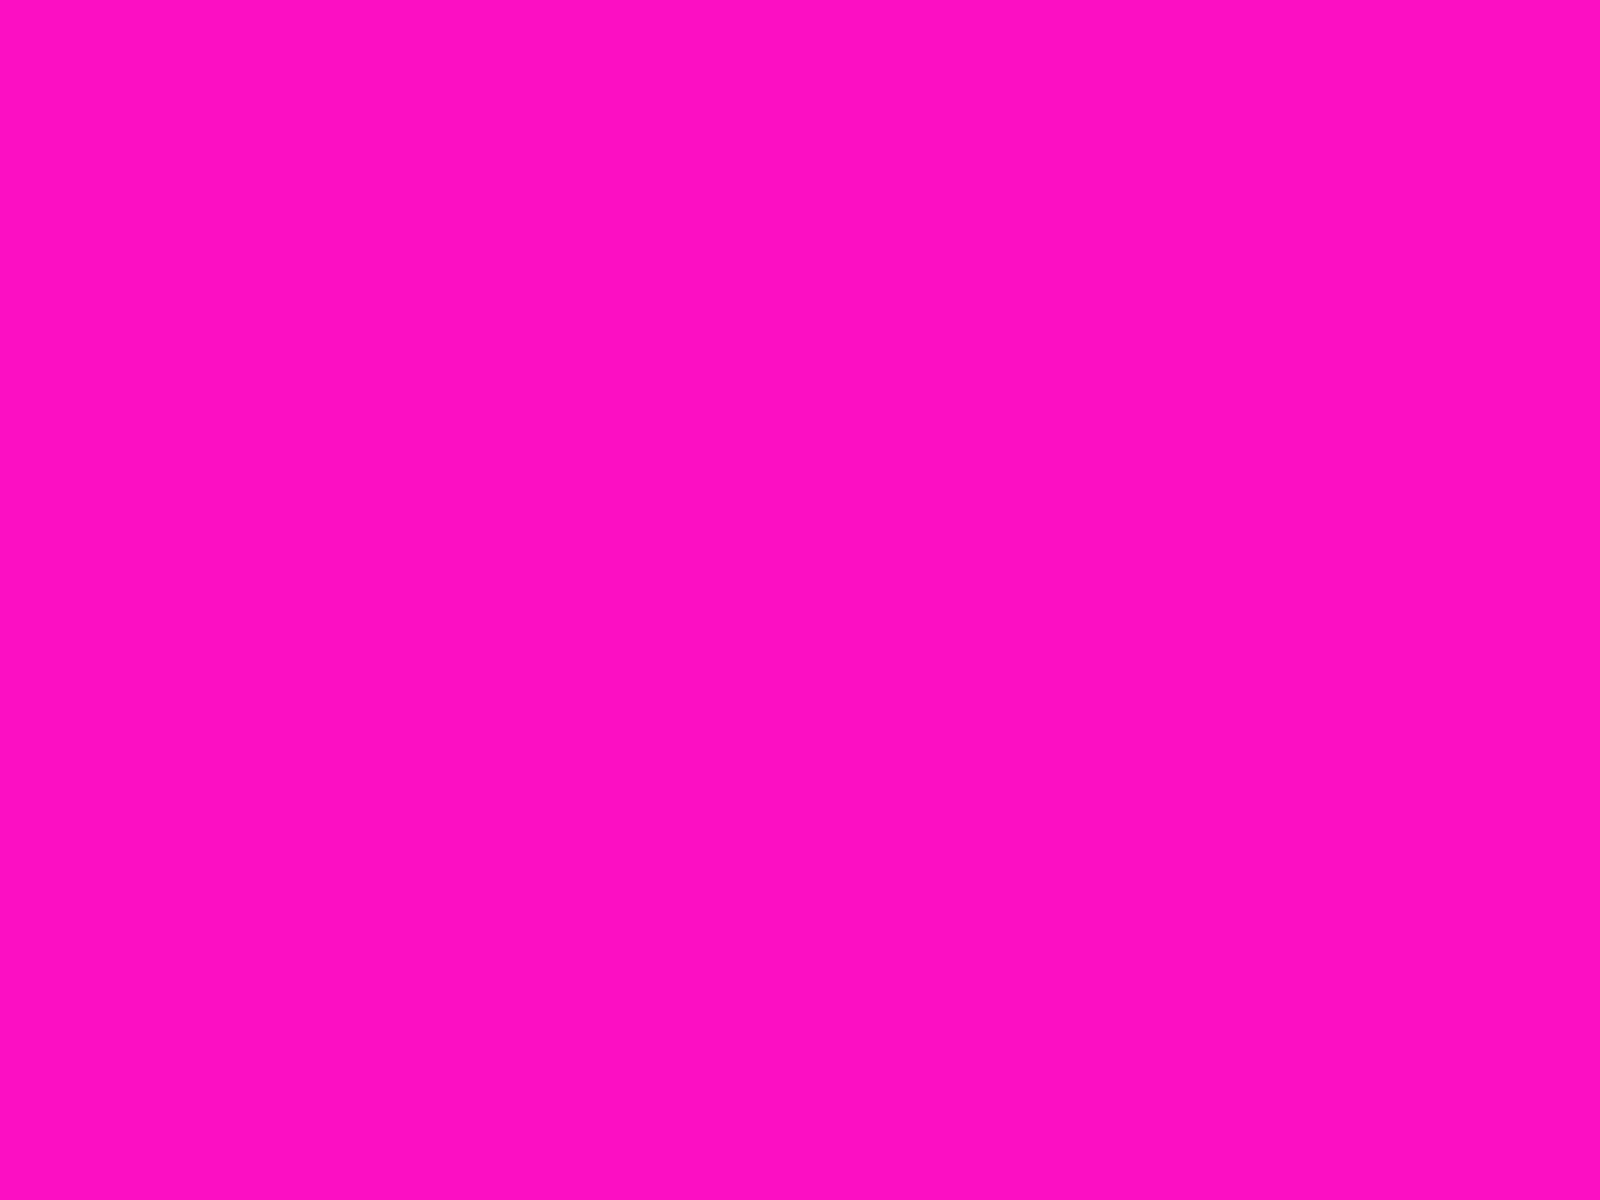 1600x1200 Shocking Pink Solid Color Background